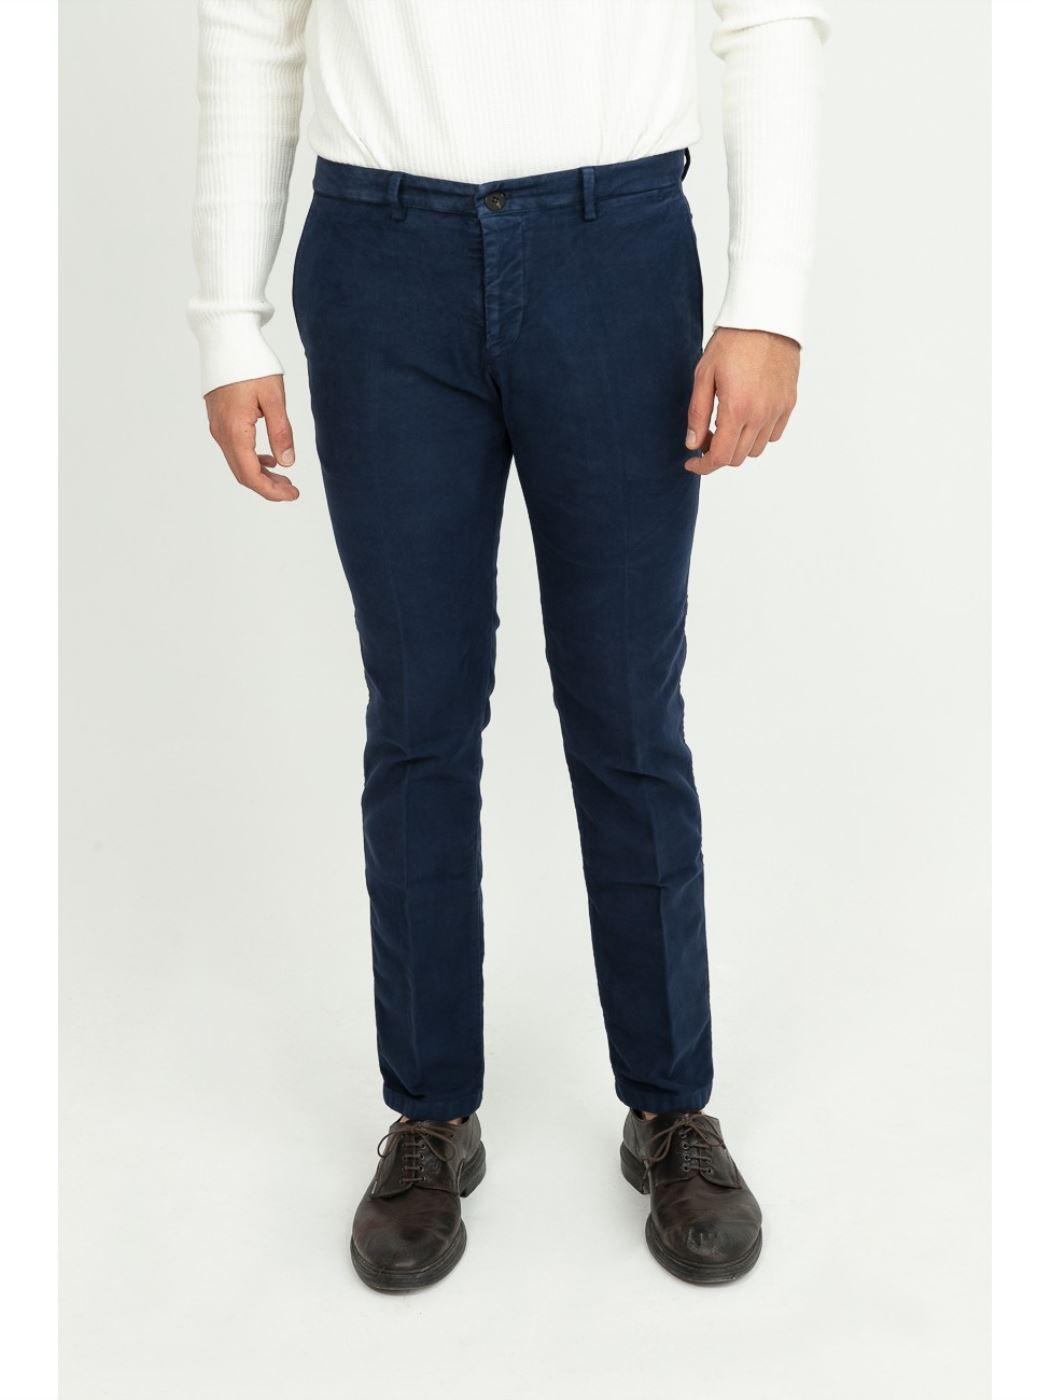 Pantalone Uomo PULAP